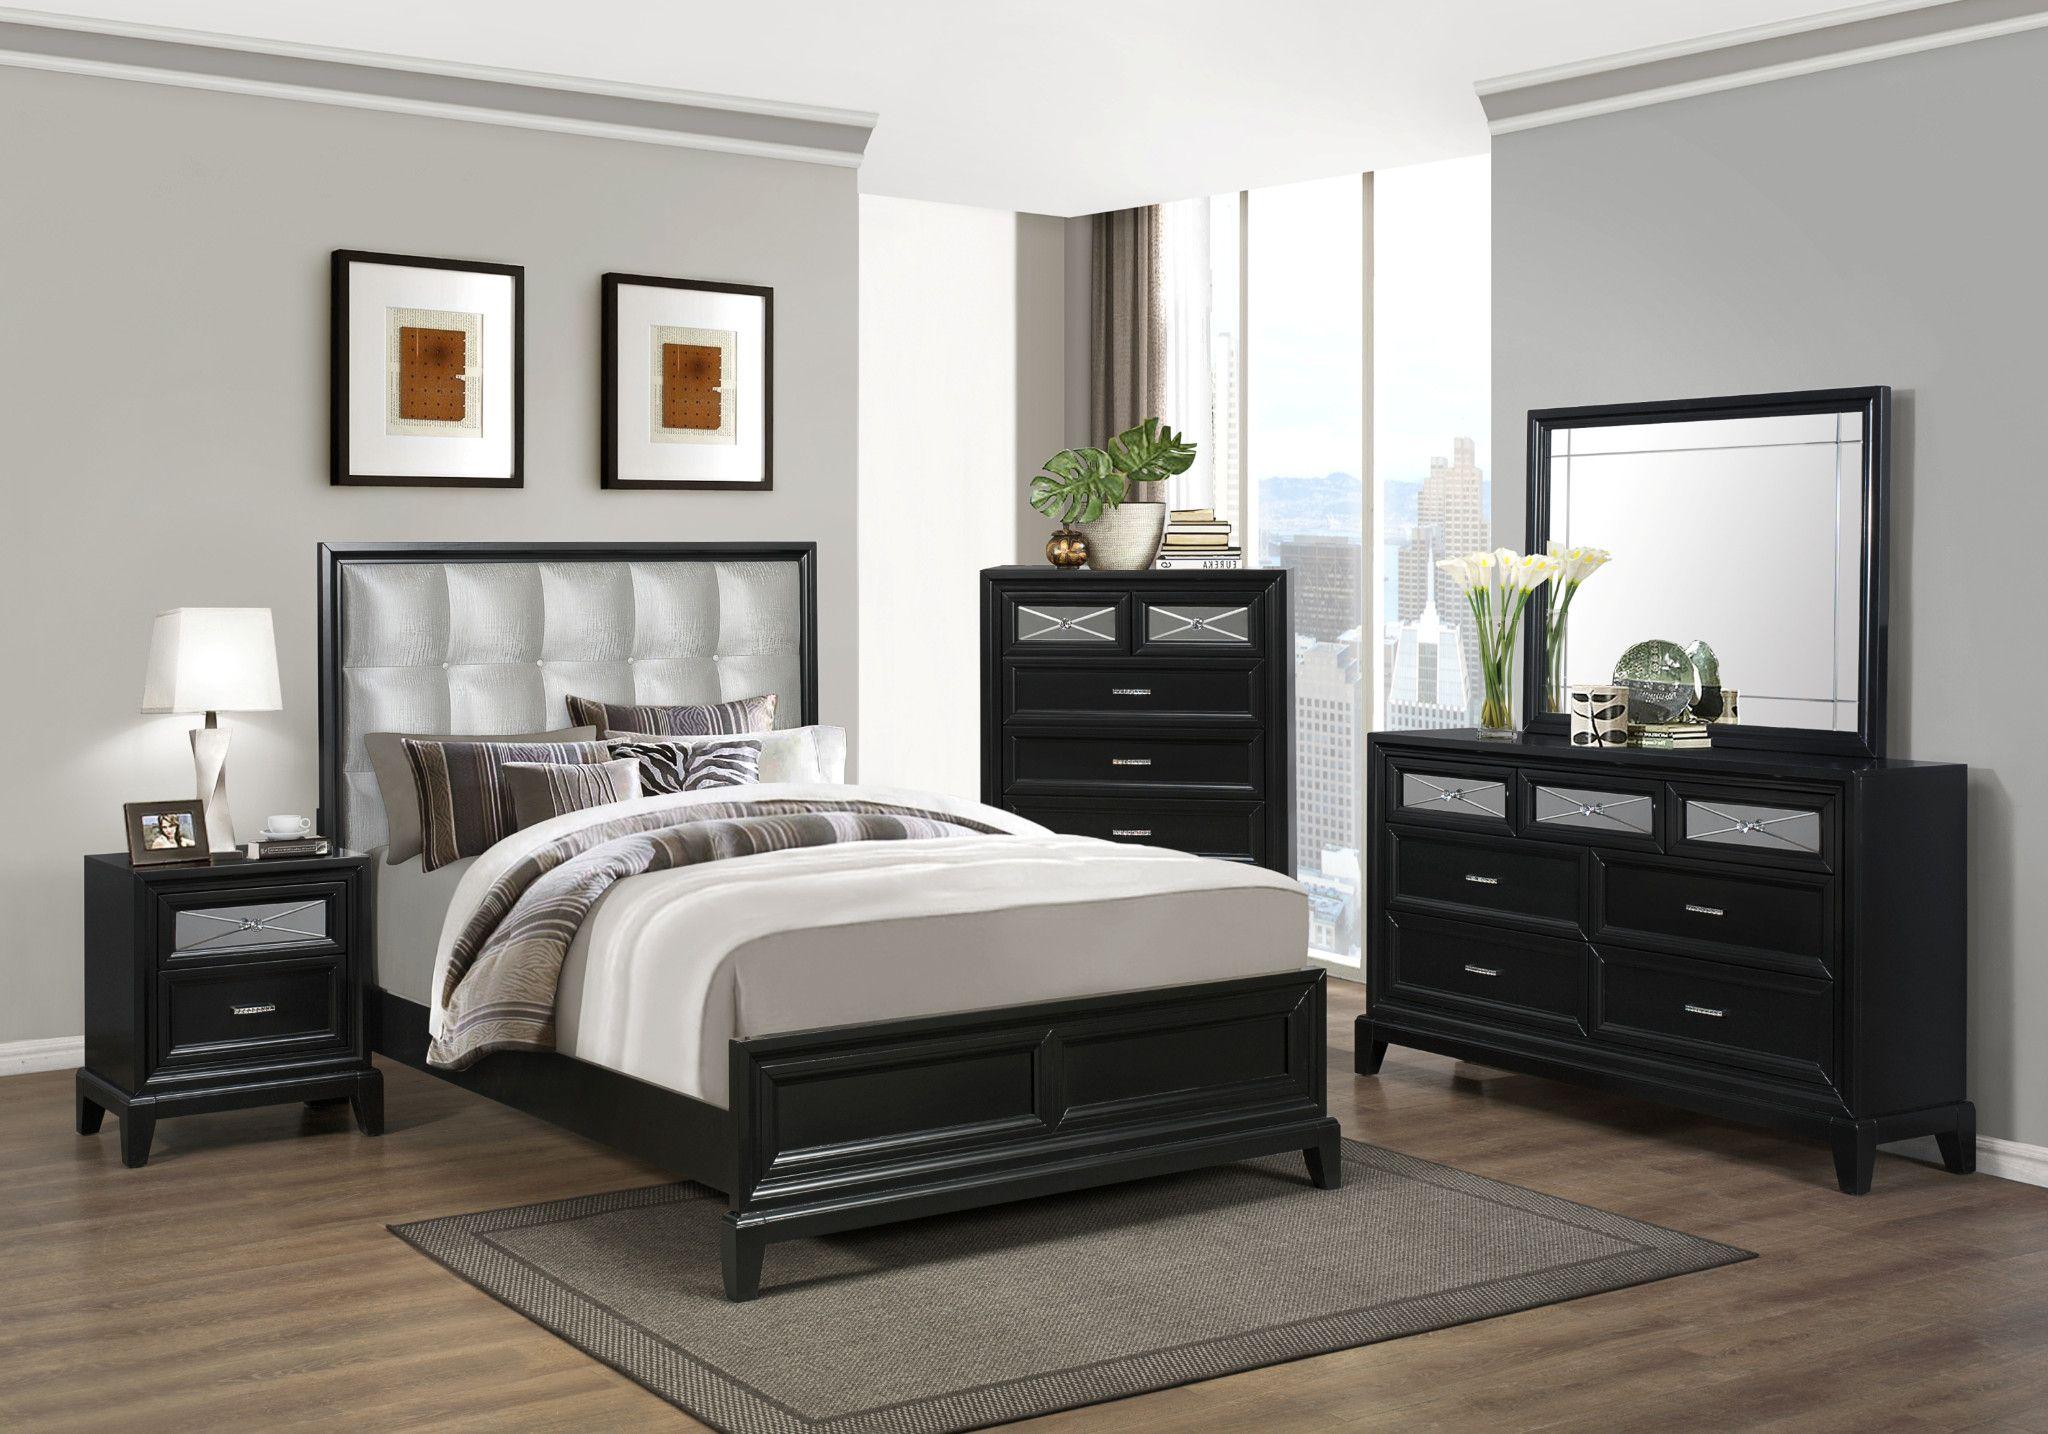 35+ Elise bedroom furniture ideas in 2021